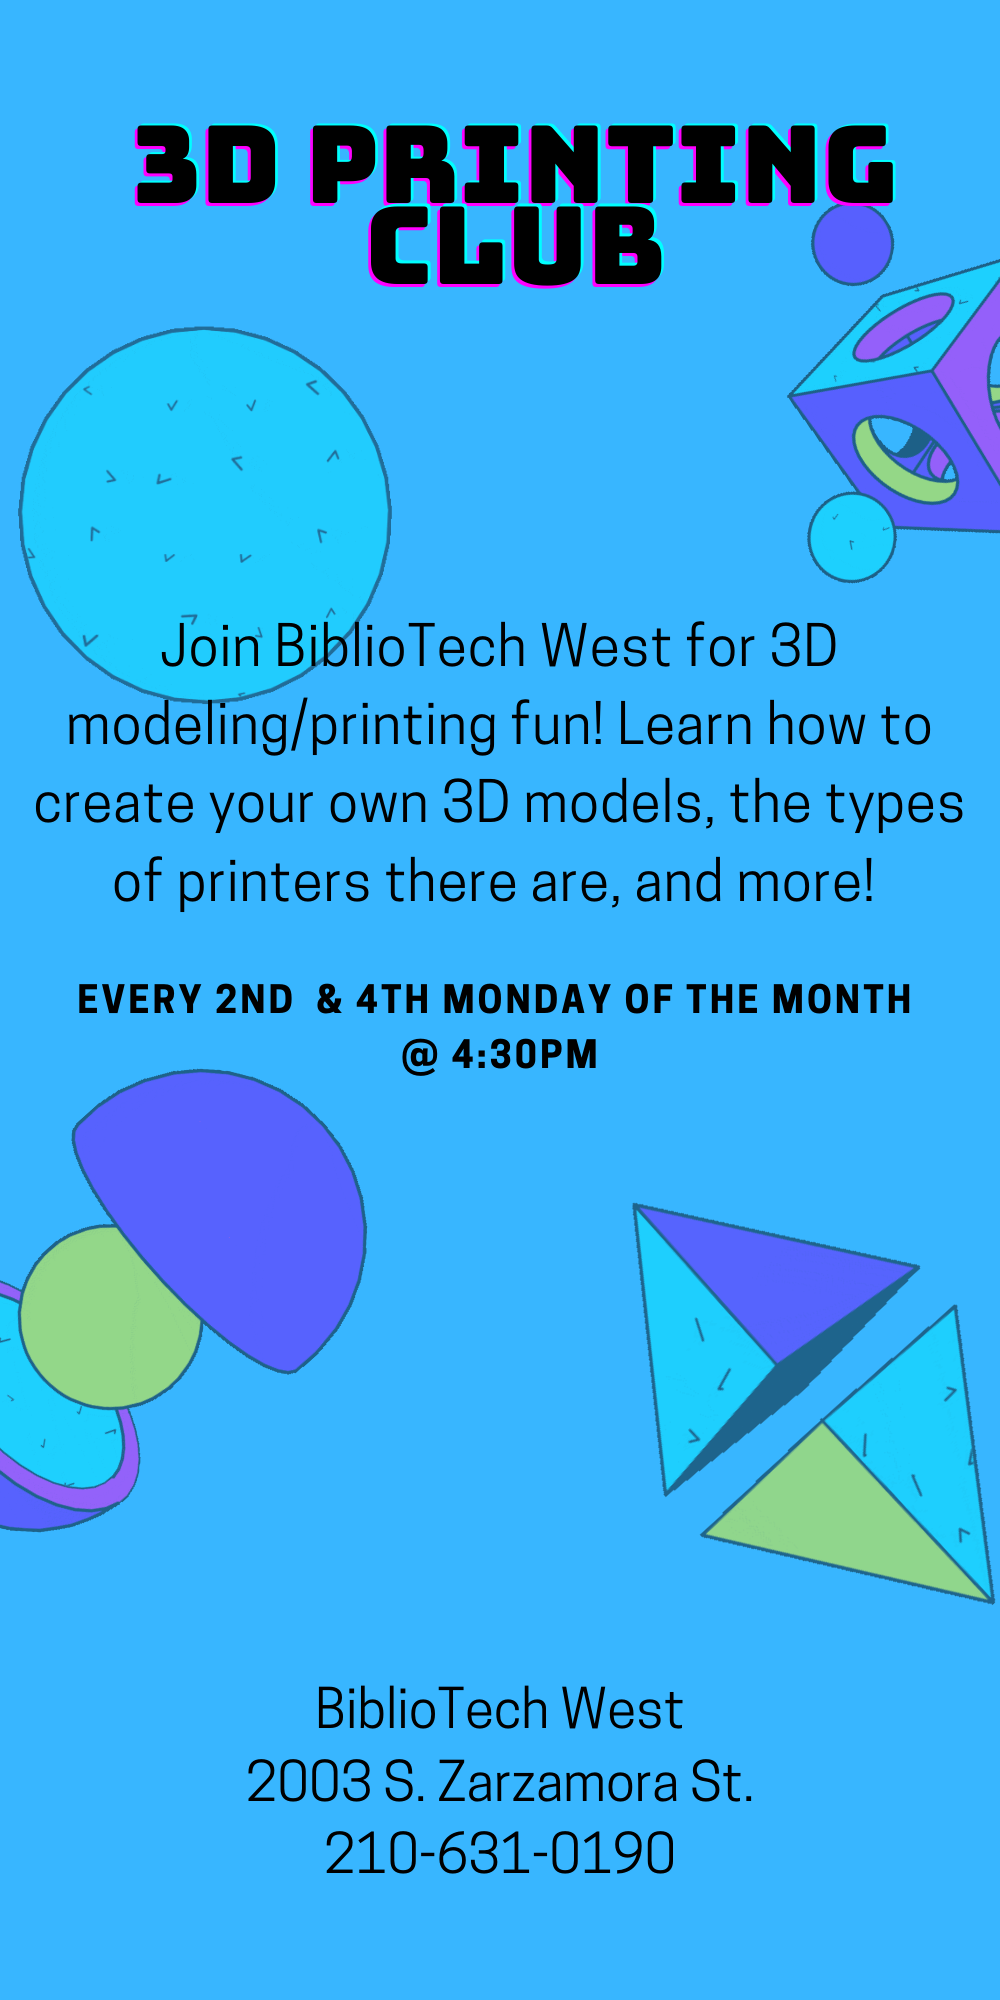 3D Printing Club - West Branch